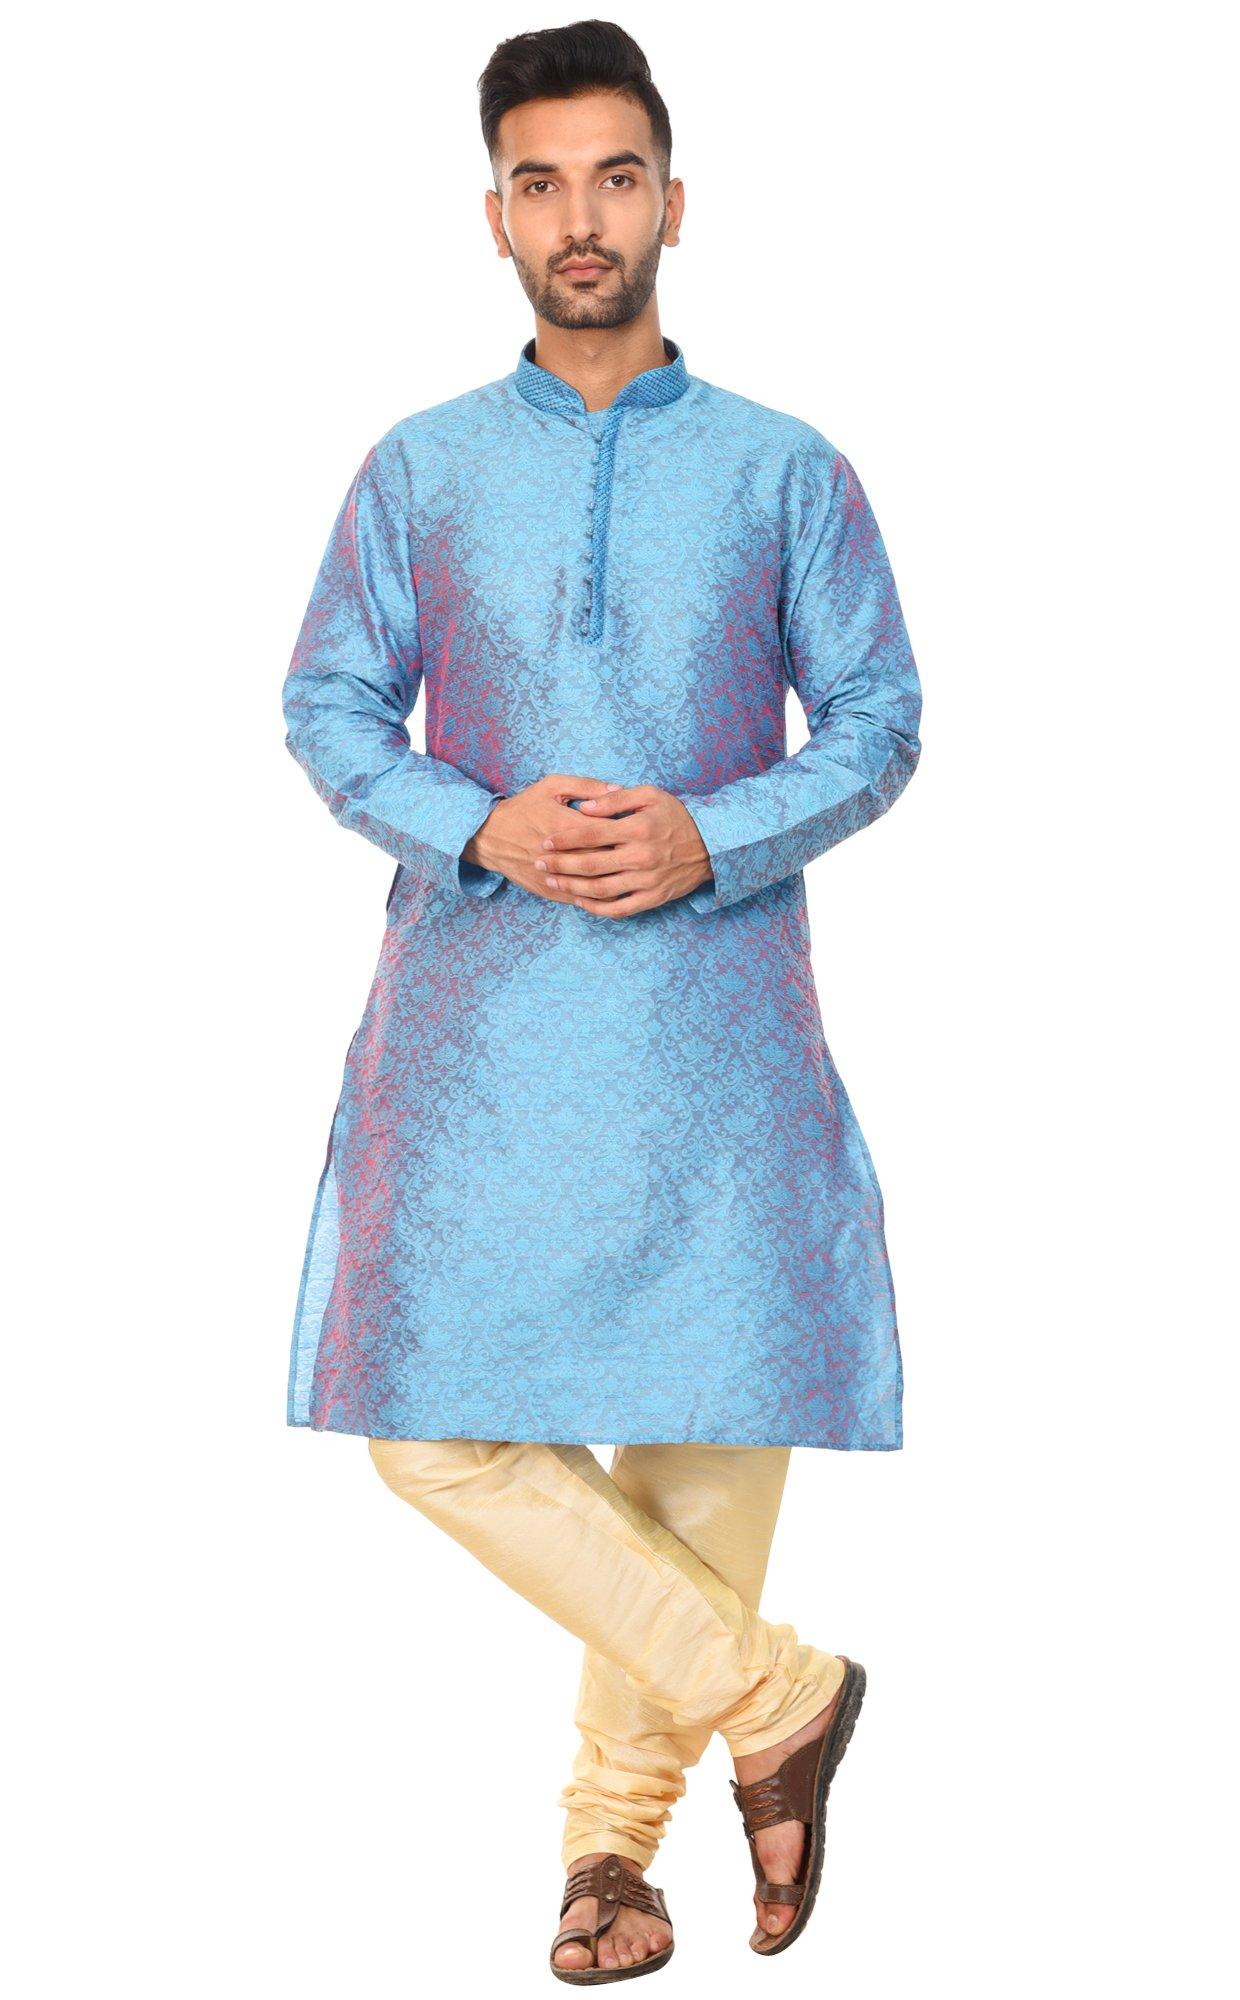 Kurta Pajama Wedding Casual Party Long Dresses Long Sleeve Shirt Summer Fashion Dress -XL